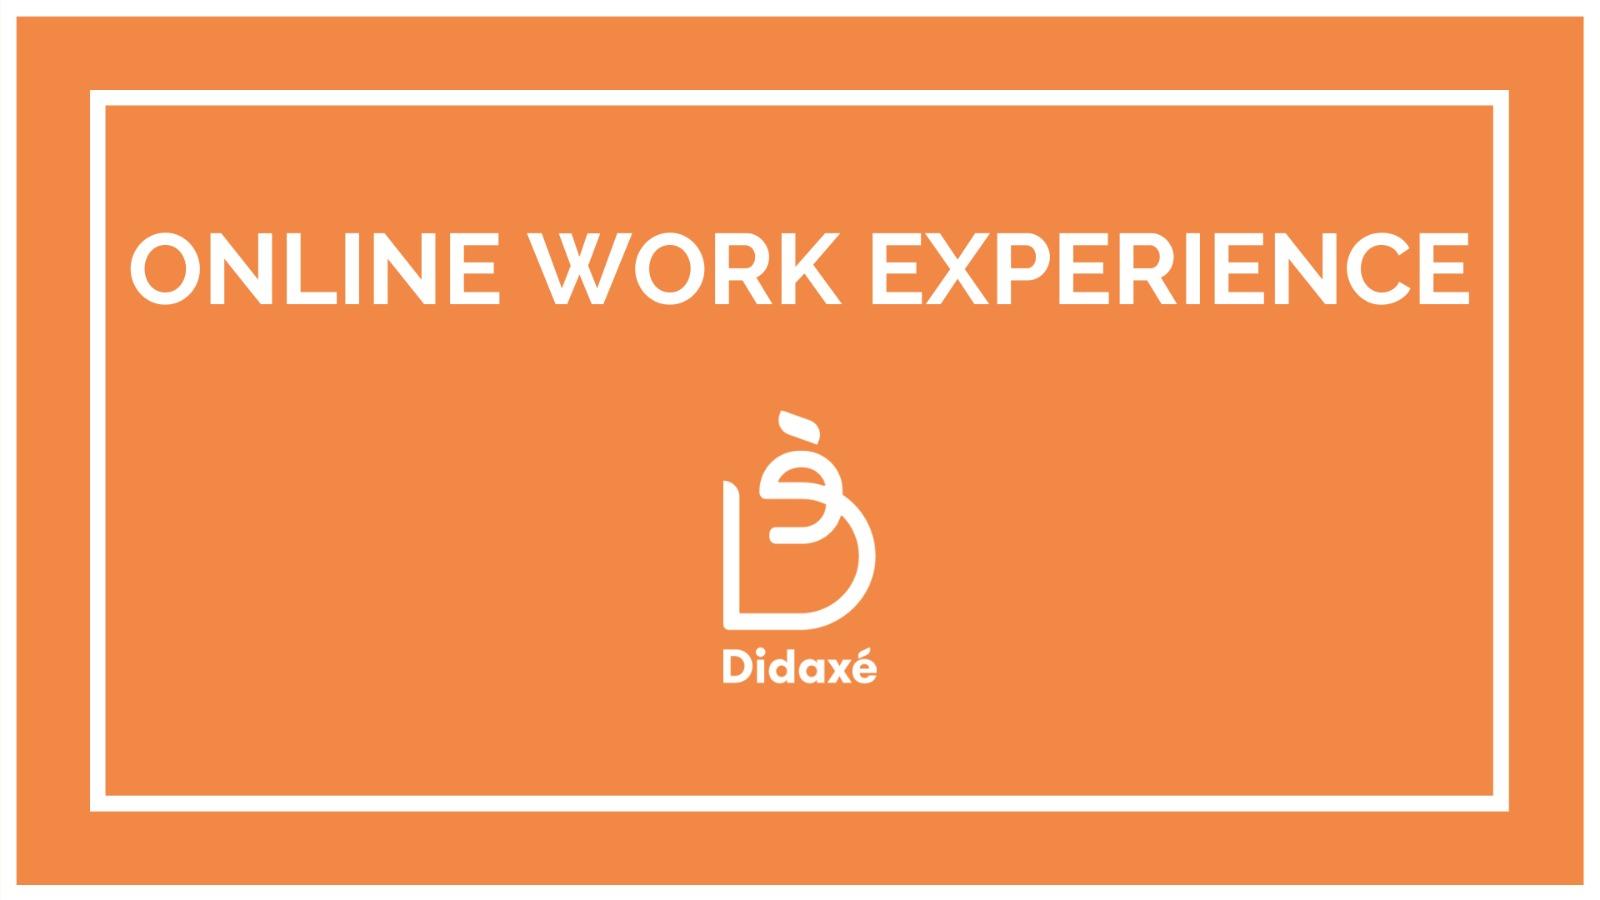 Online Work Experiences